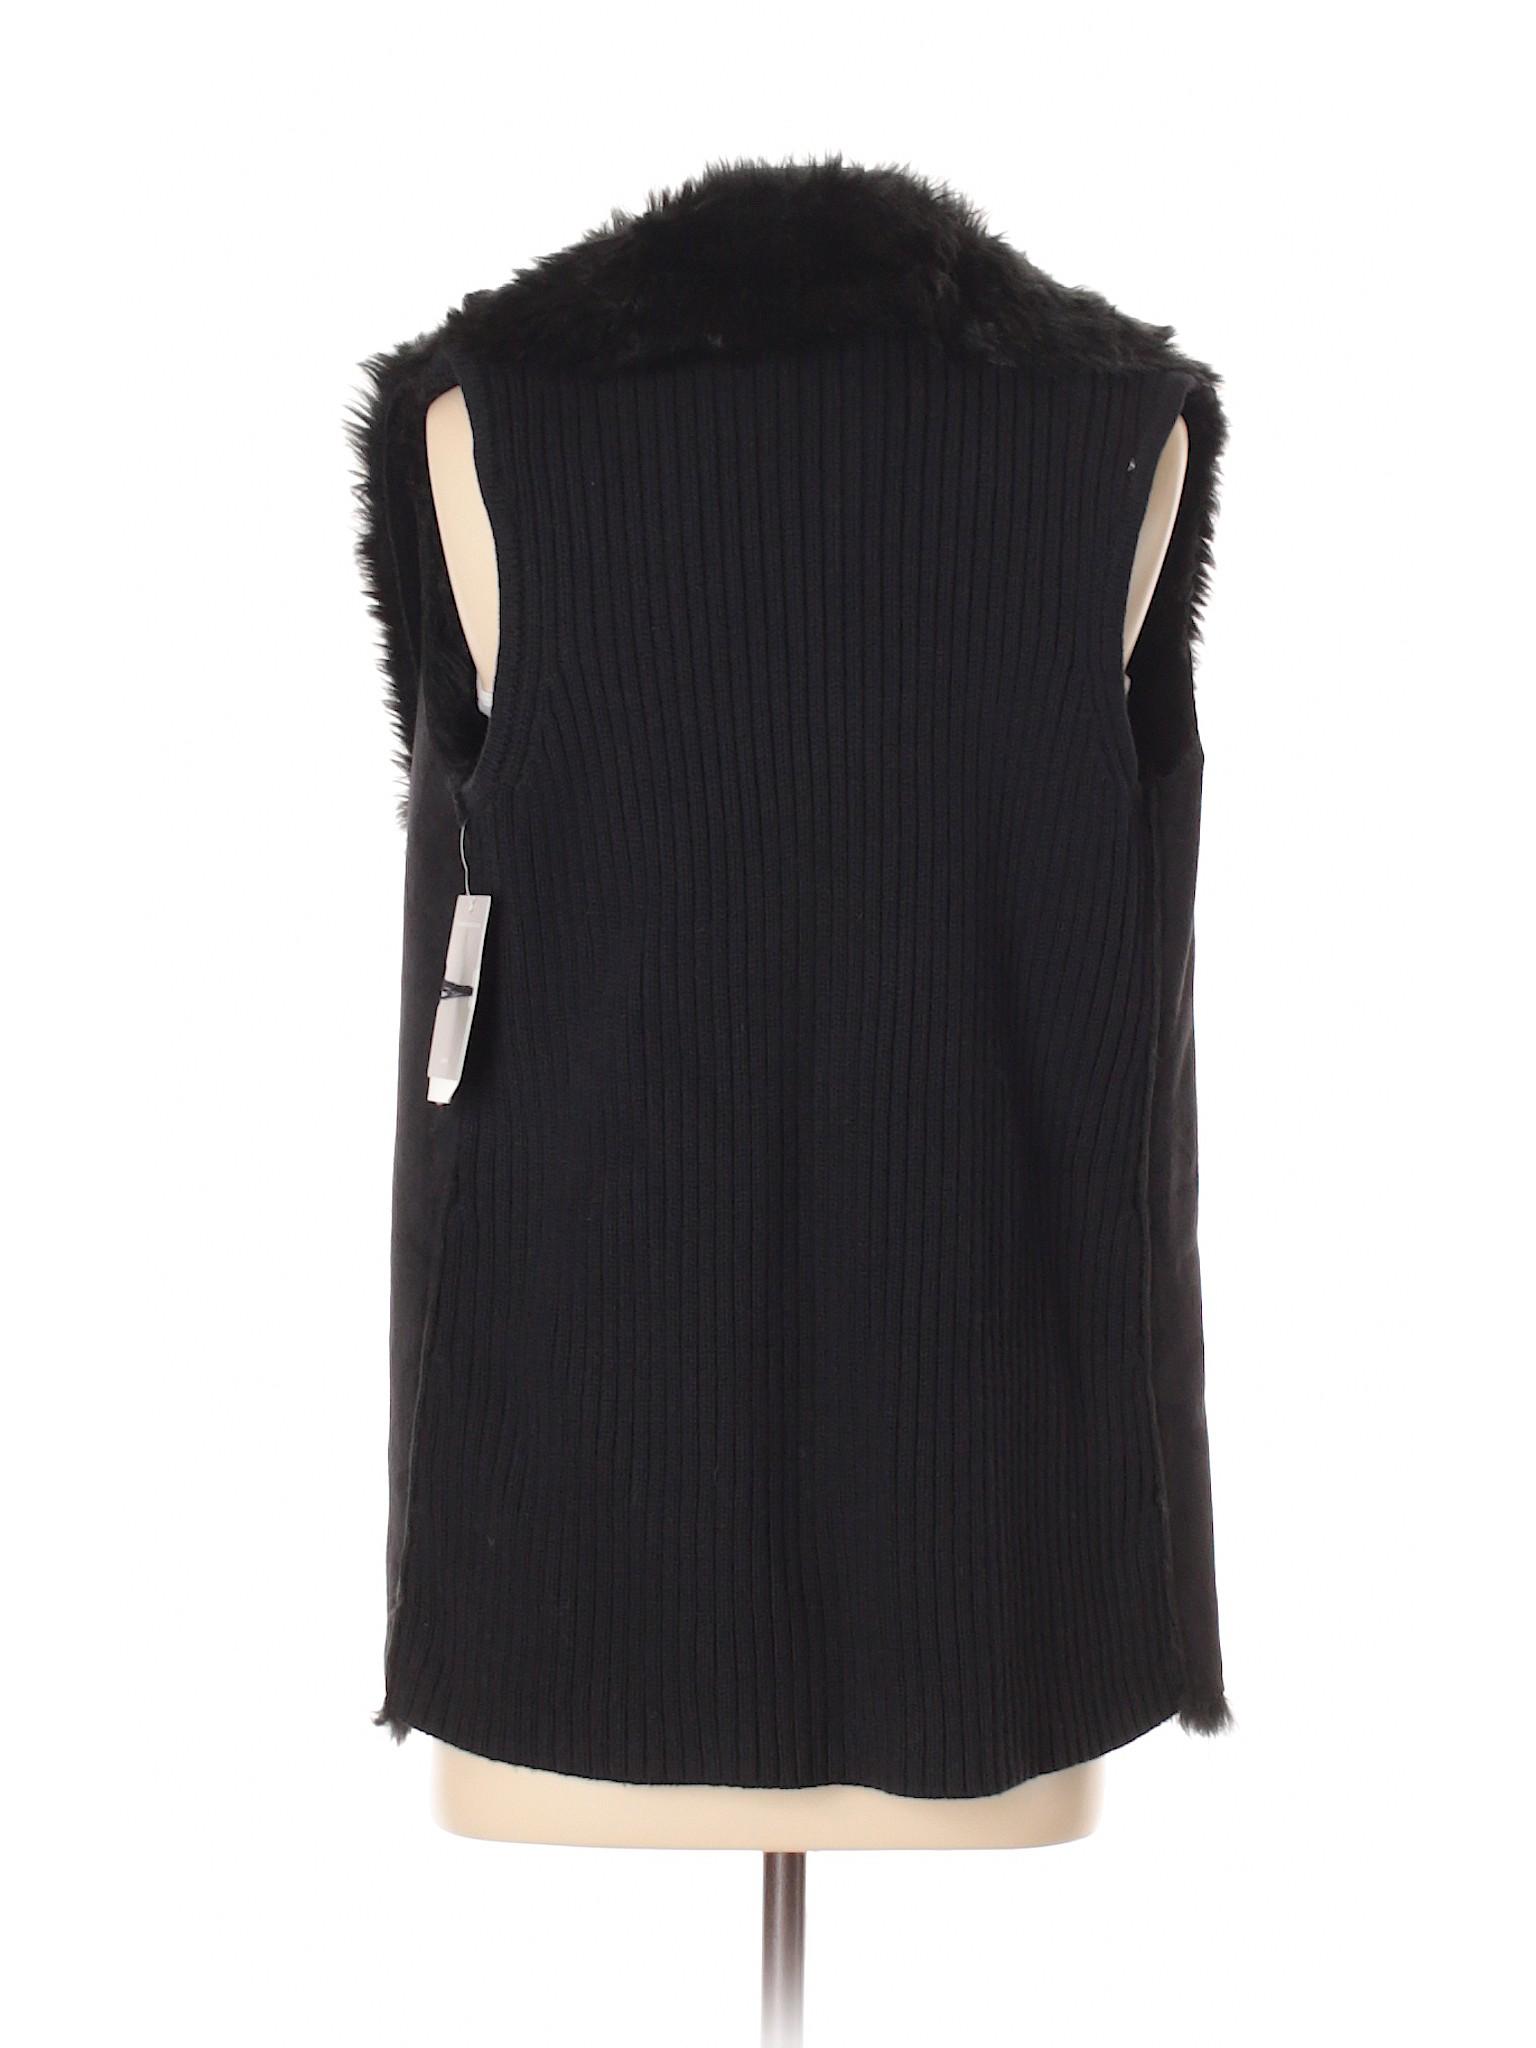 winter Vest Boutique Club Faux Charter Fur 7nnzxwqZF